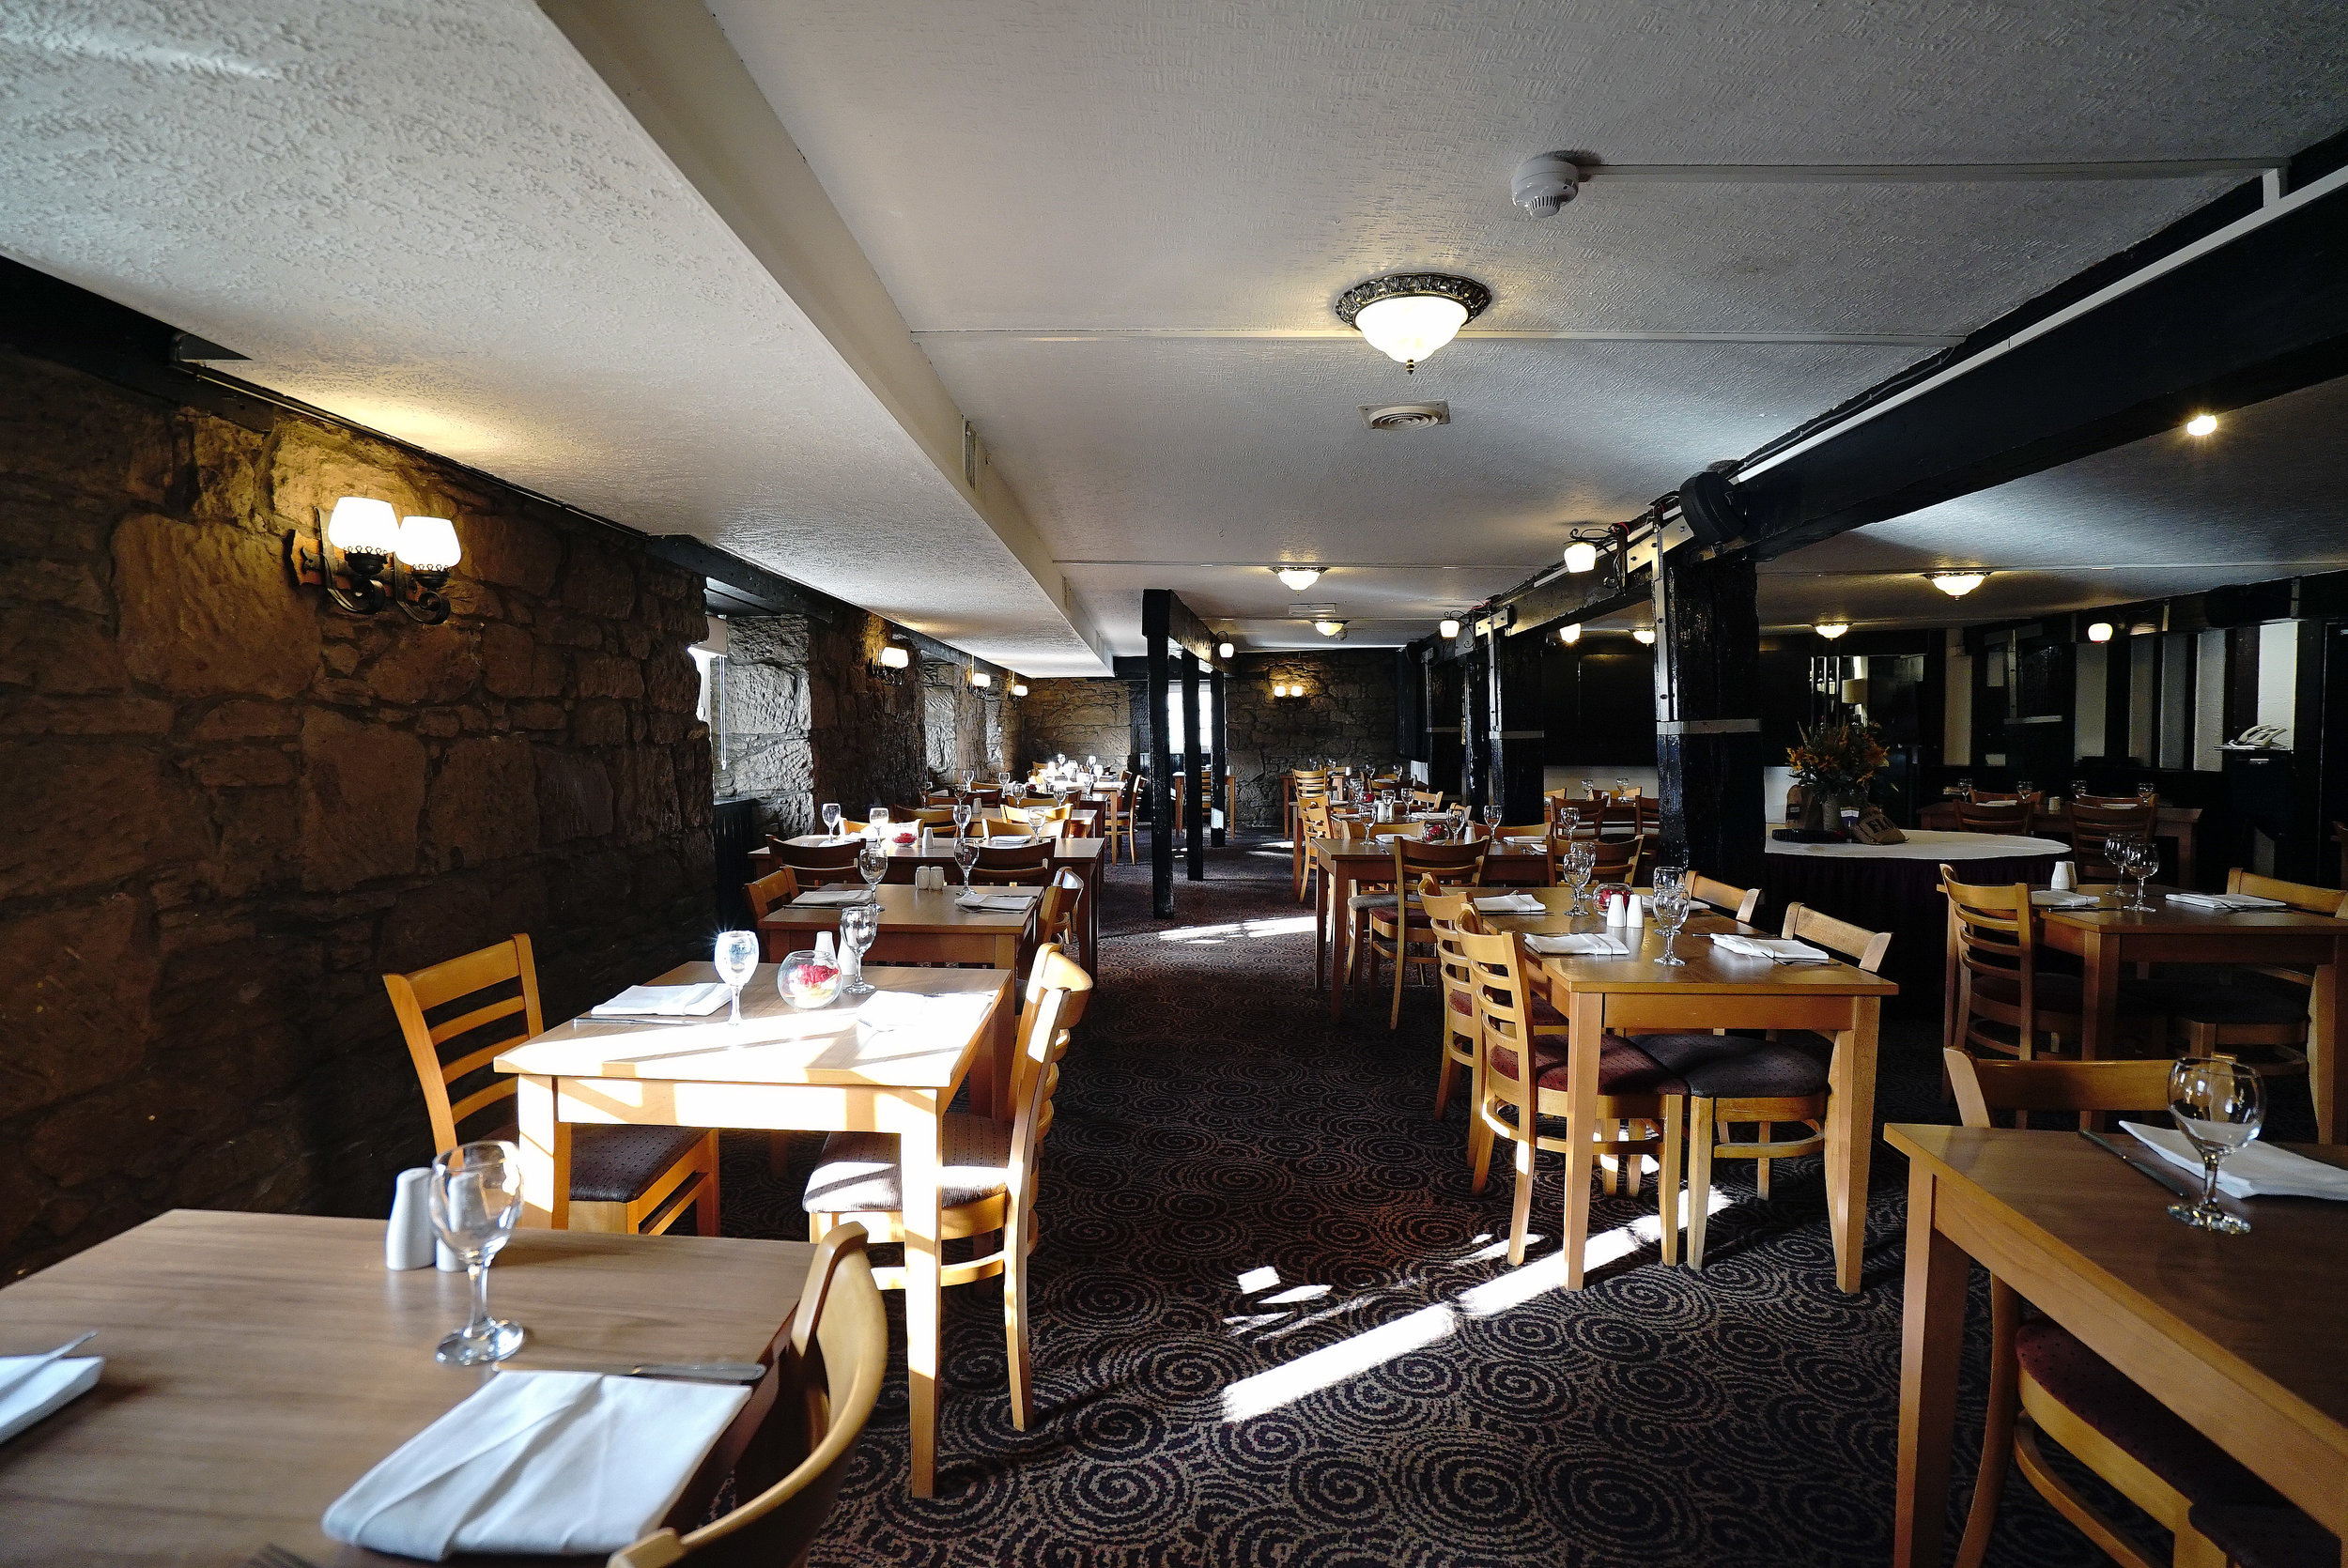 Mercure Perth Dining Room 2.jpg